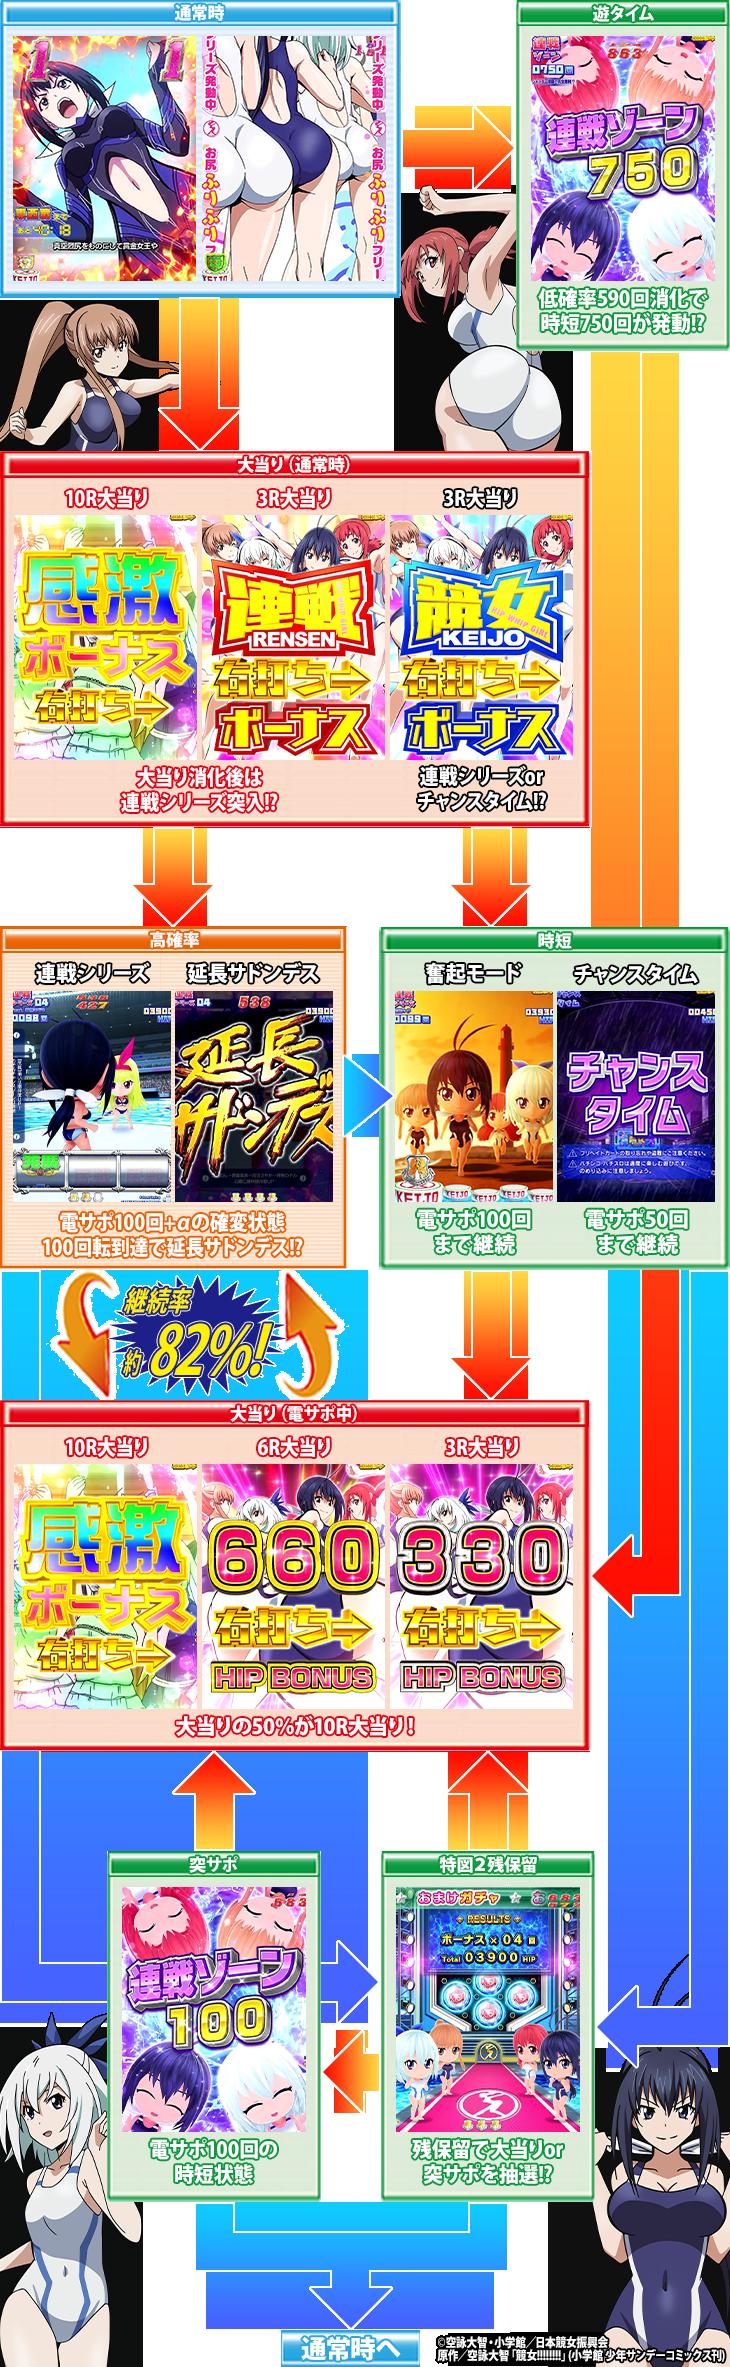 P競女!!!!!!!!-KEIJO-199ver.のゲームフロー画像